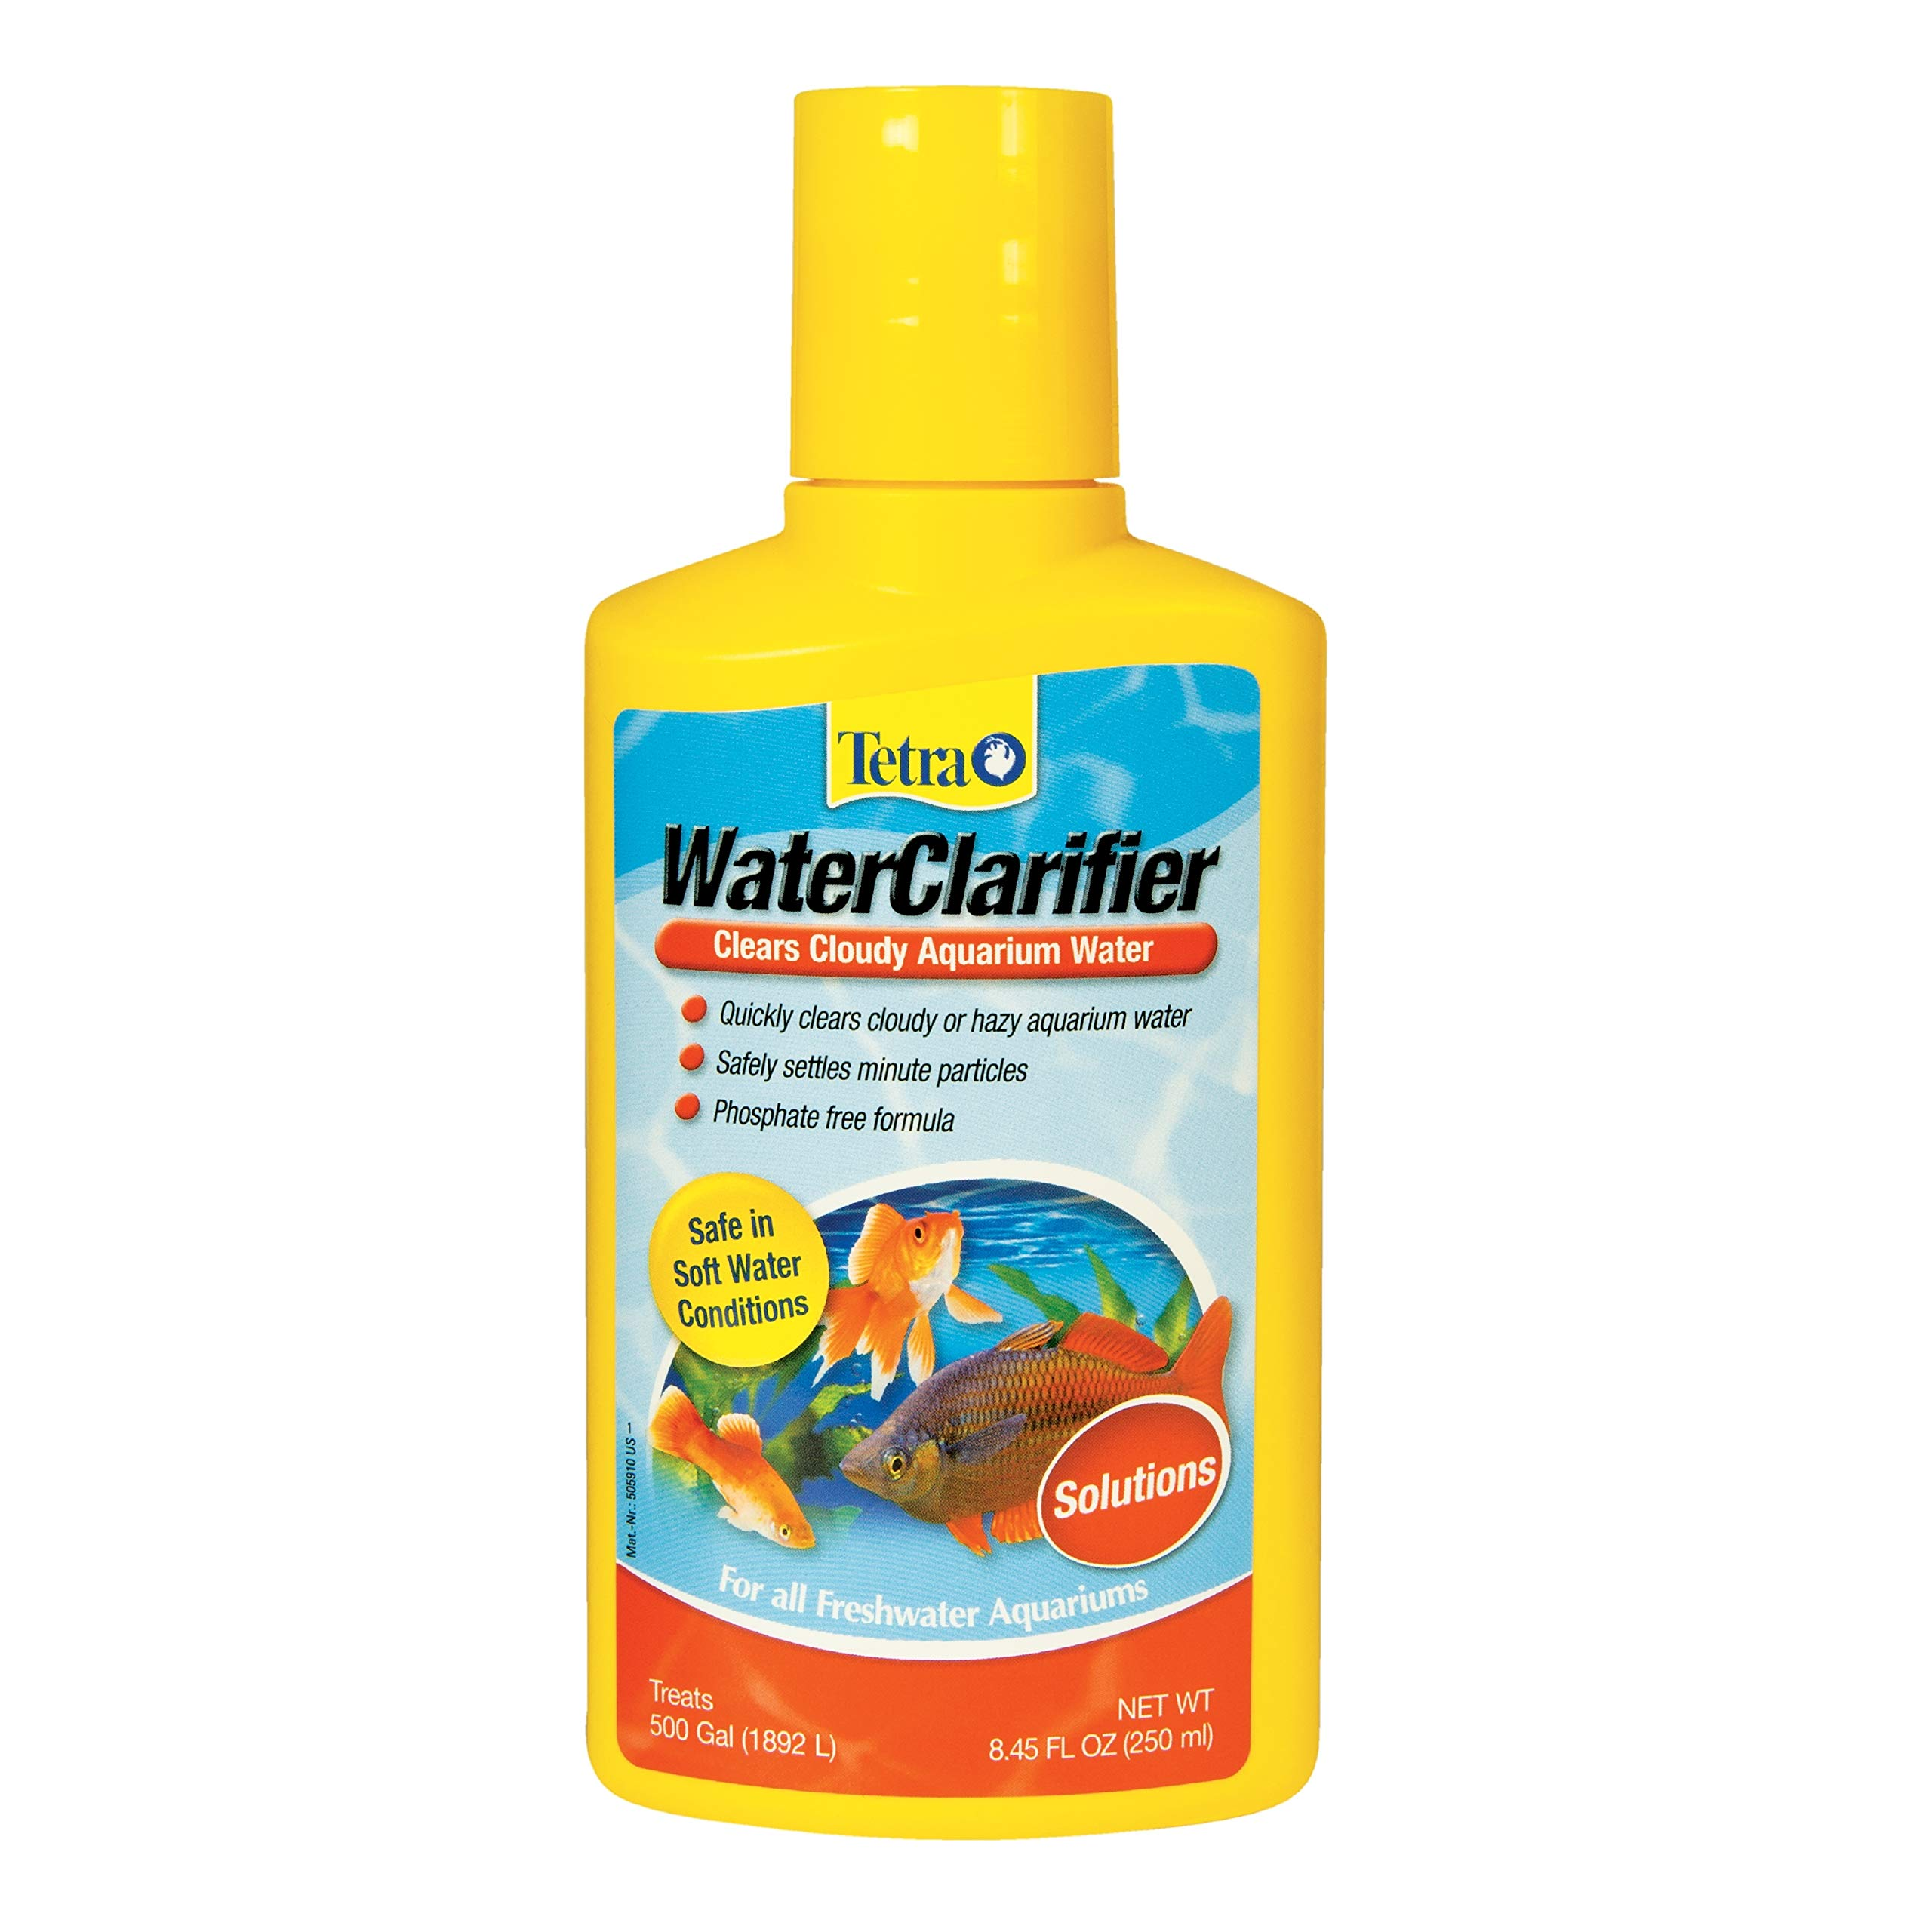 Tetra WaterClarifier Treatment Solution for Freshwater Aquariums